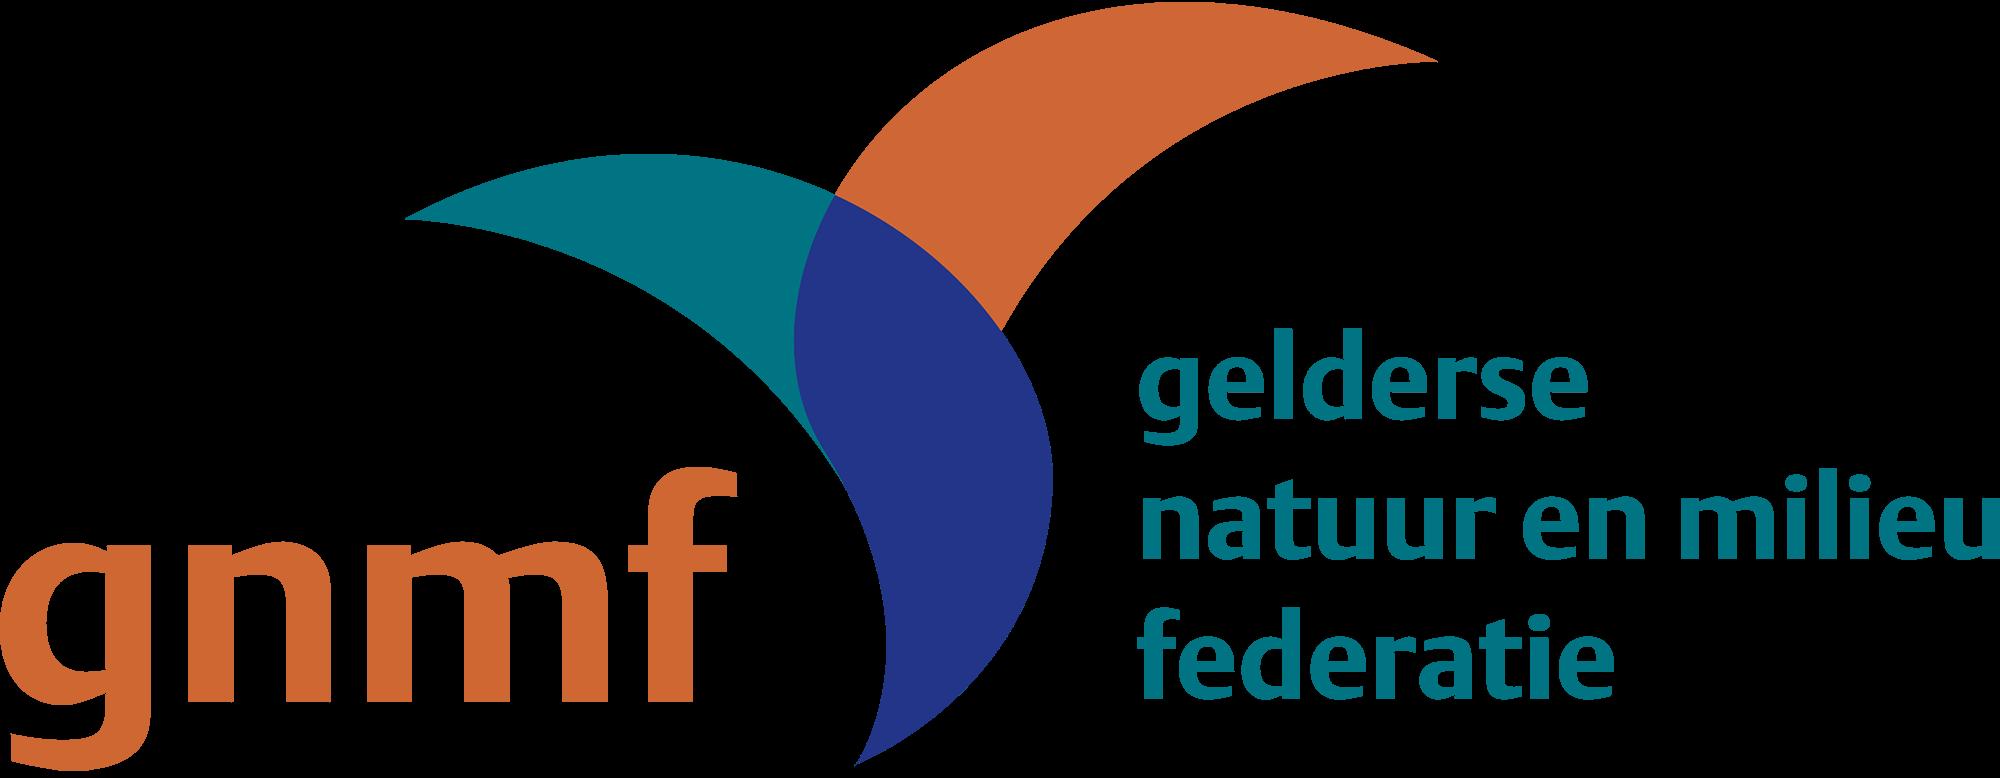 gnmf-logo-kleur